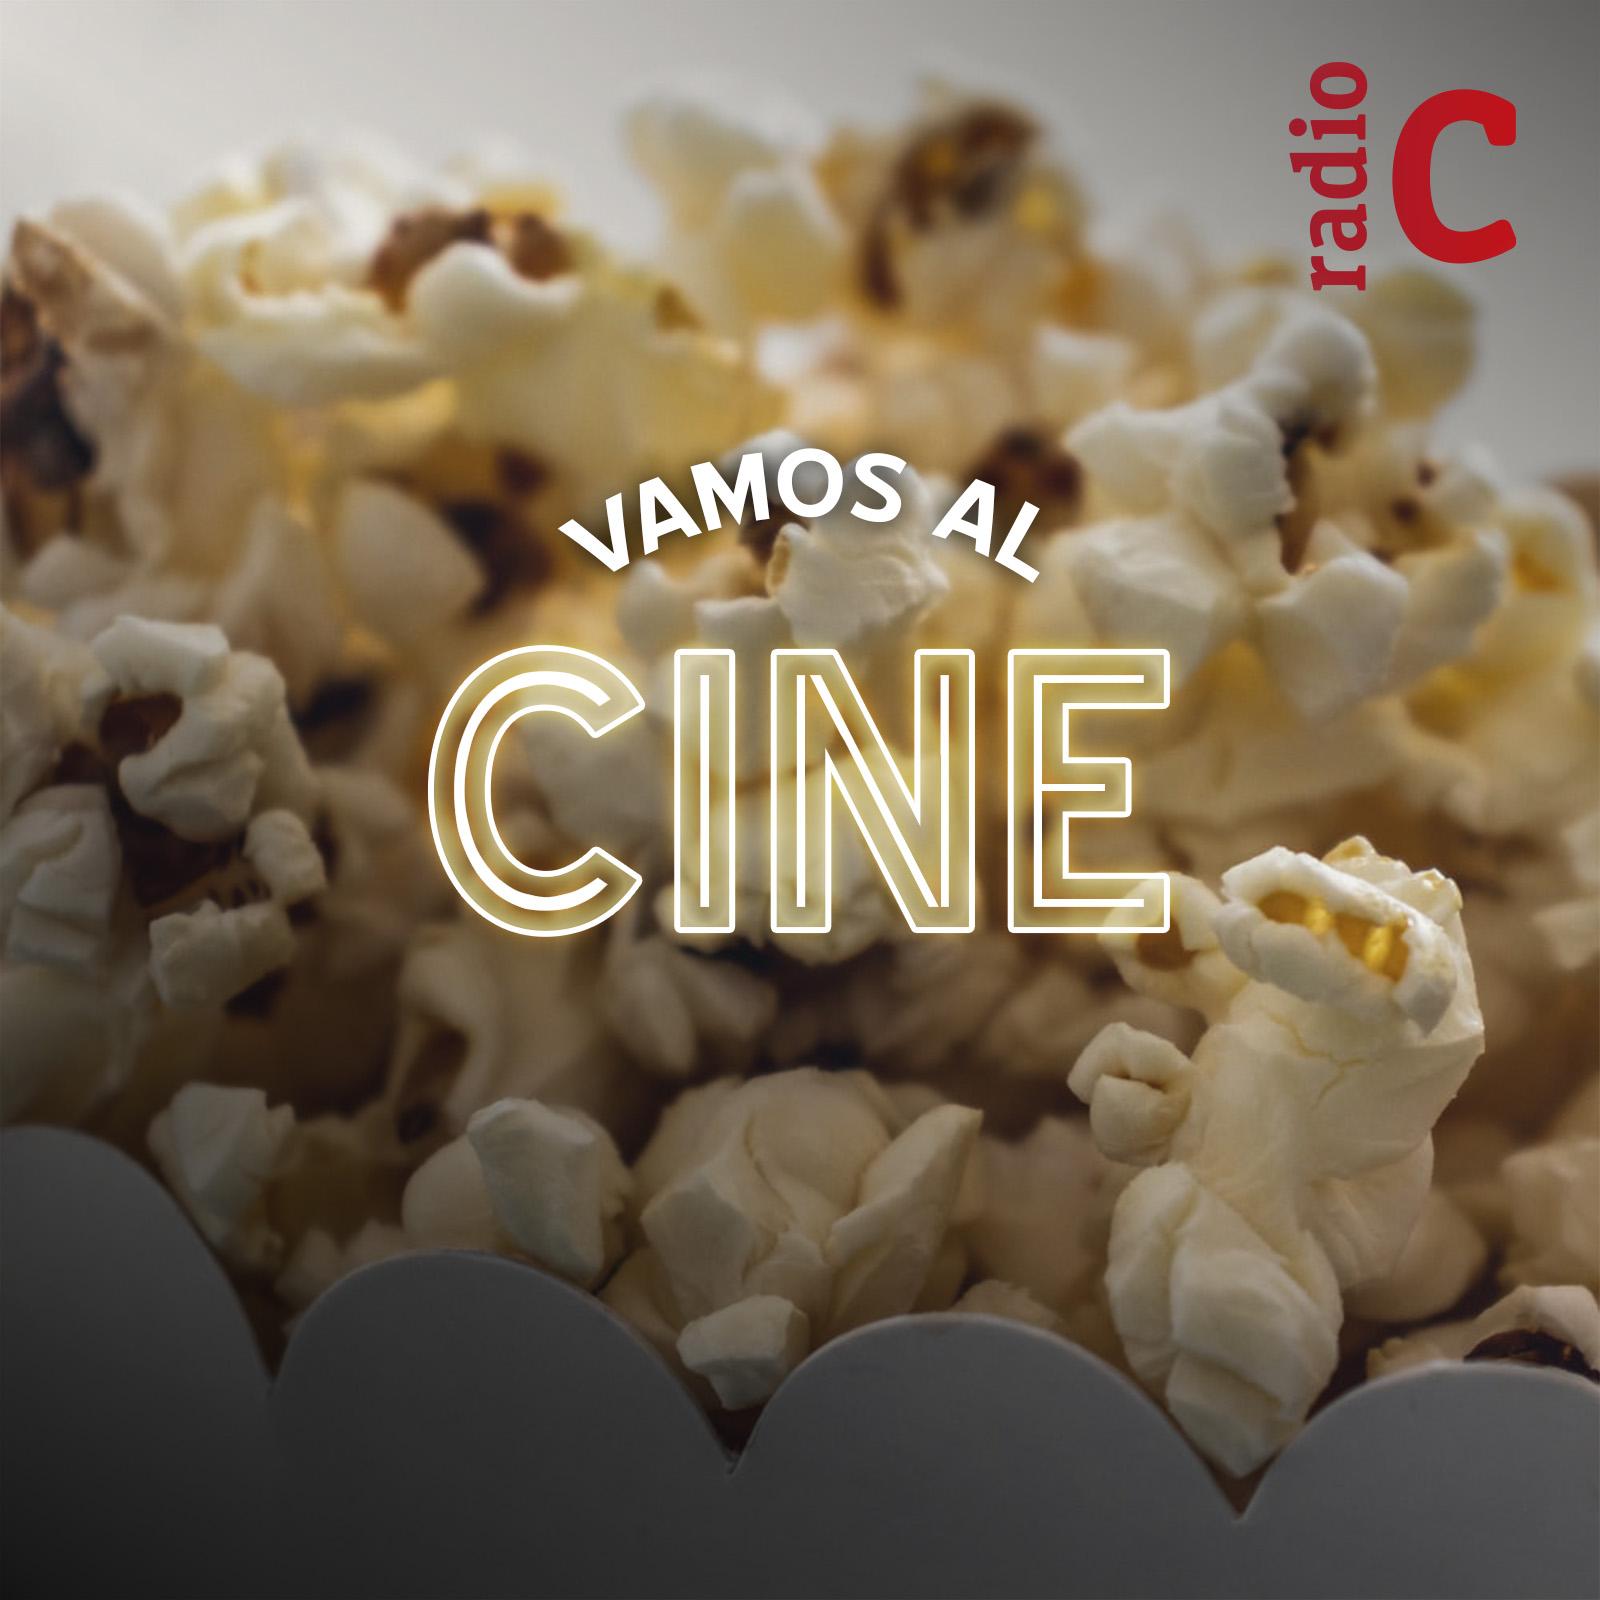 Vamos al cine